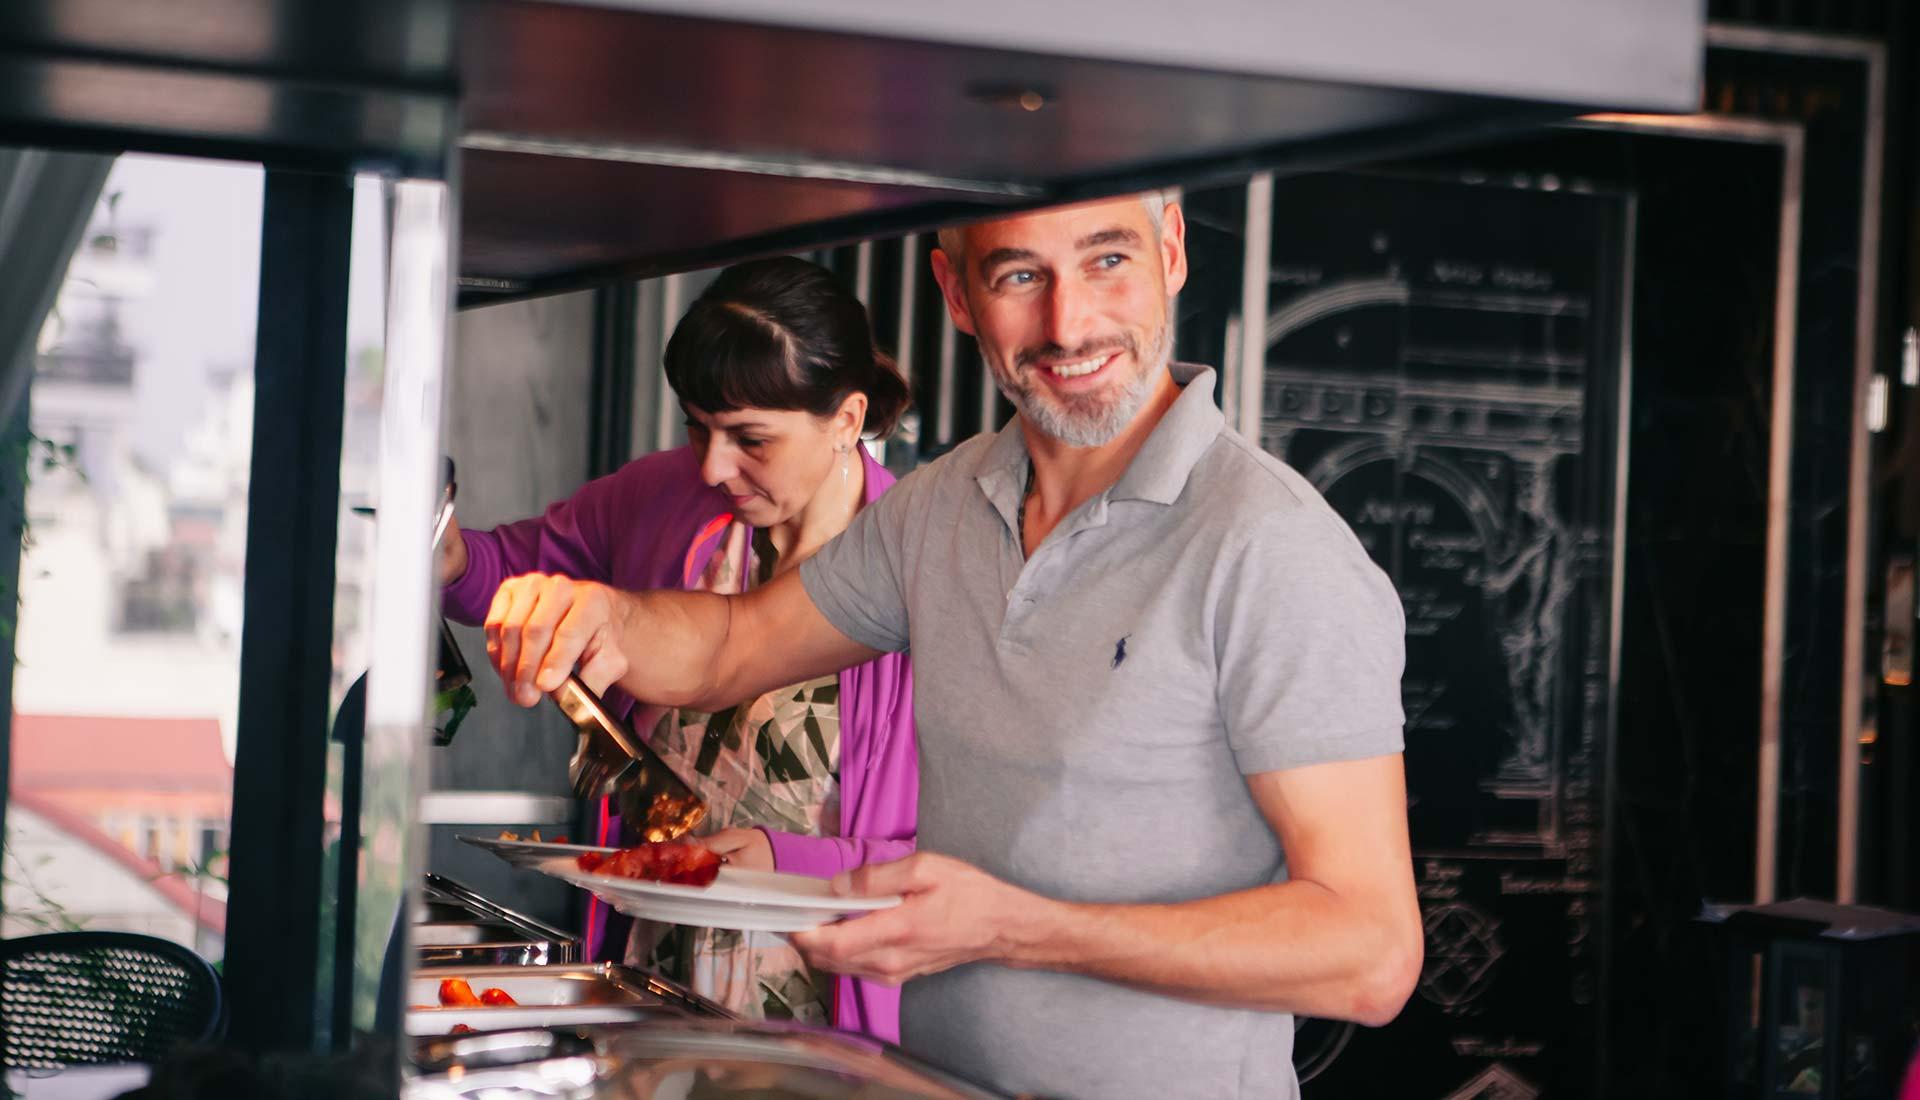 The Rhythms Restaurant